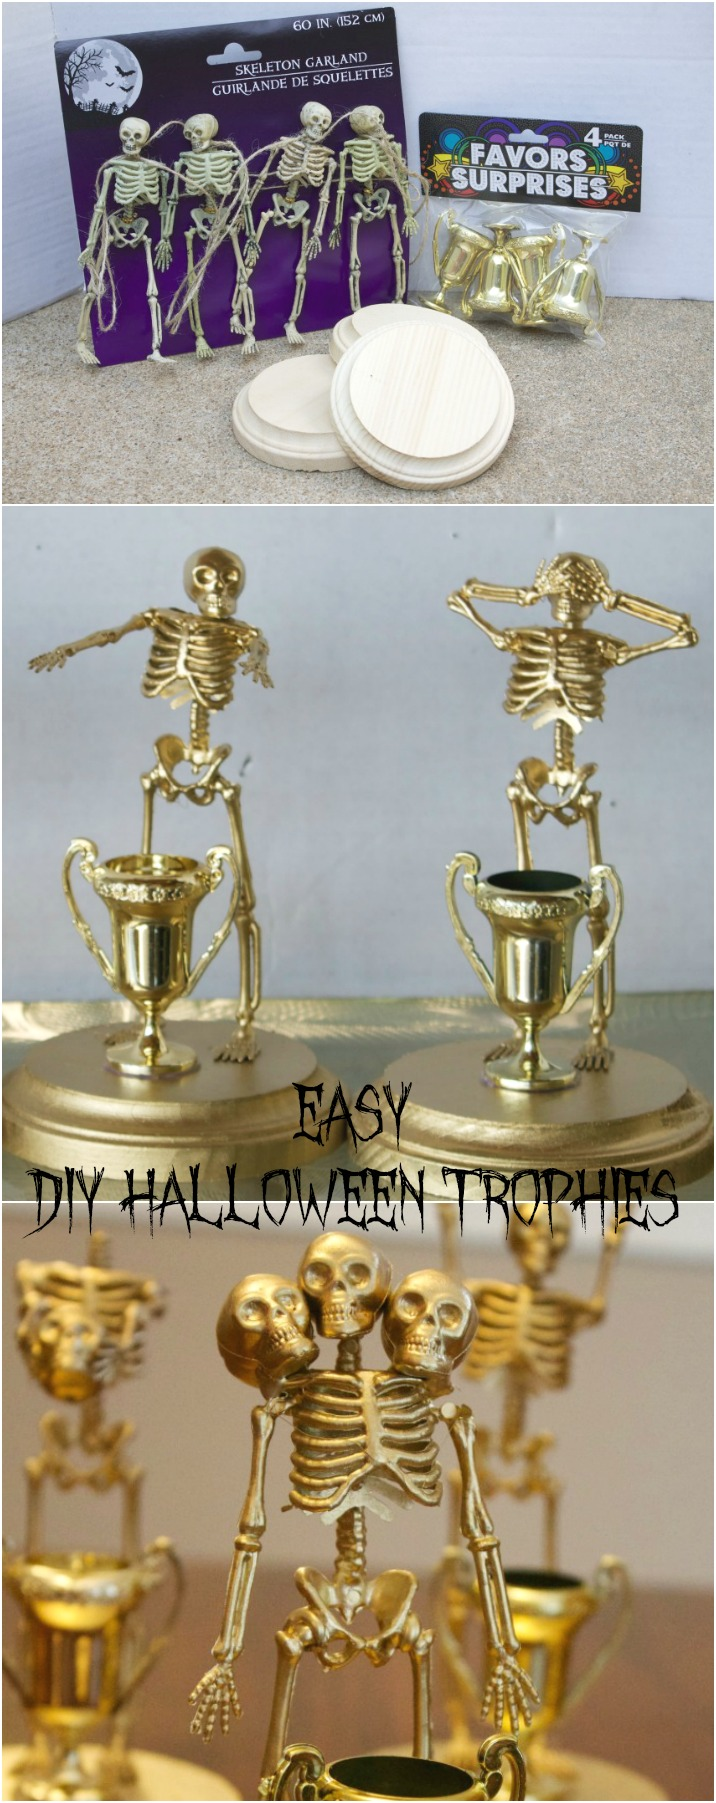 DIY Halloween Costume Contest Award Trophies